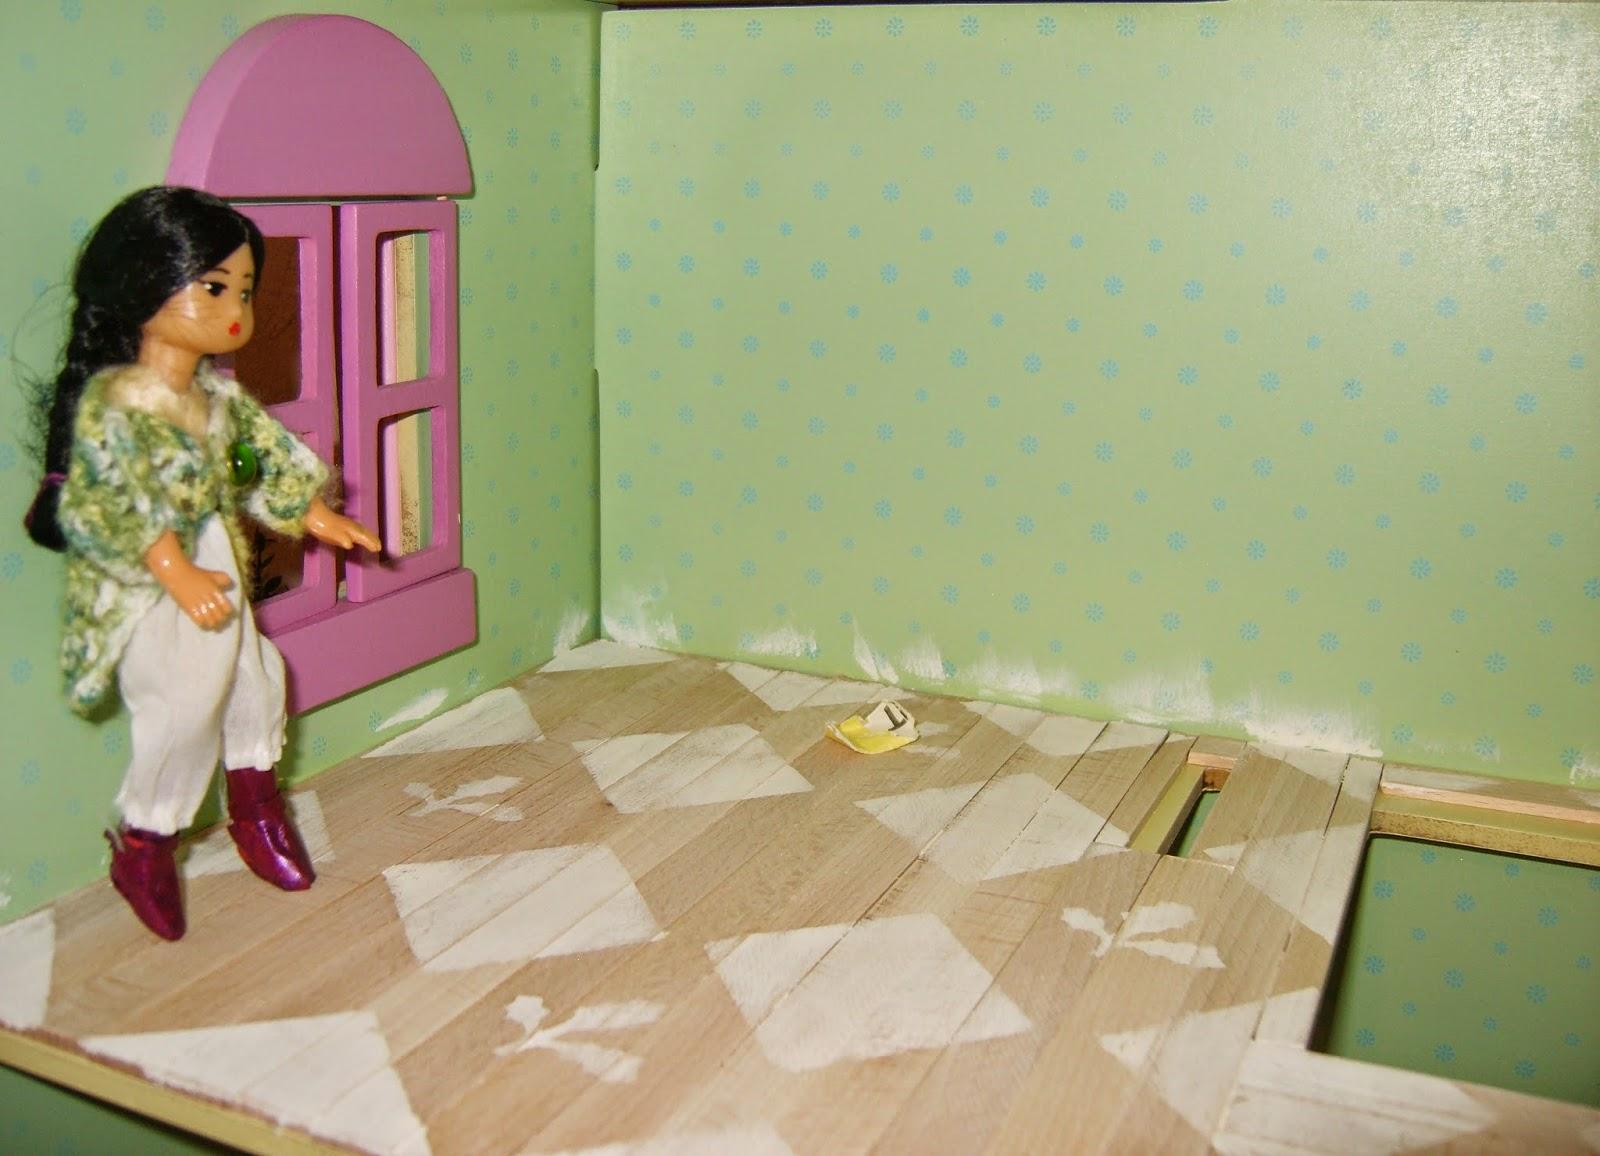 bilteman tikut, kuviomaalattu lattia